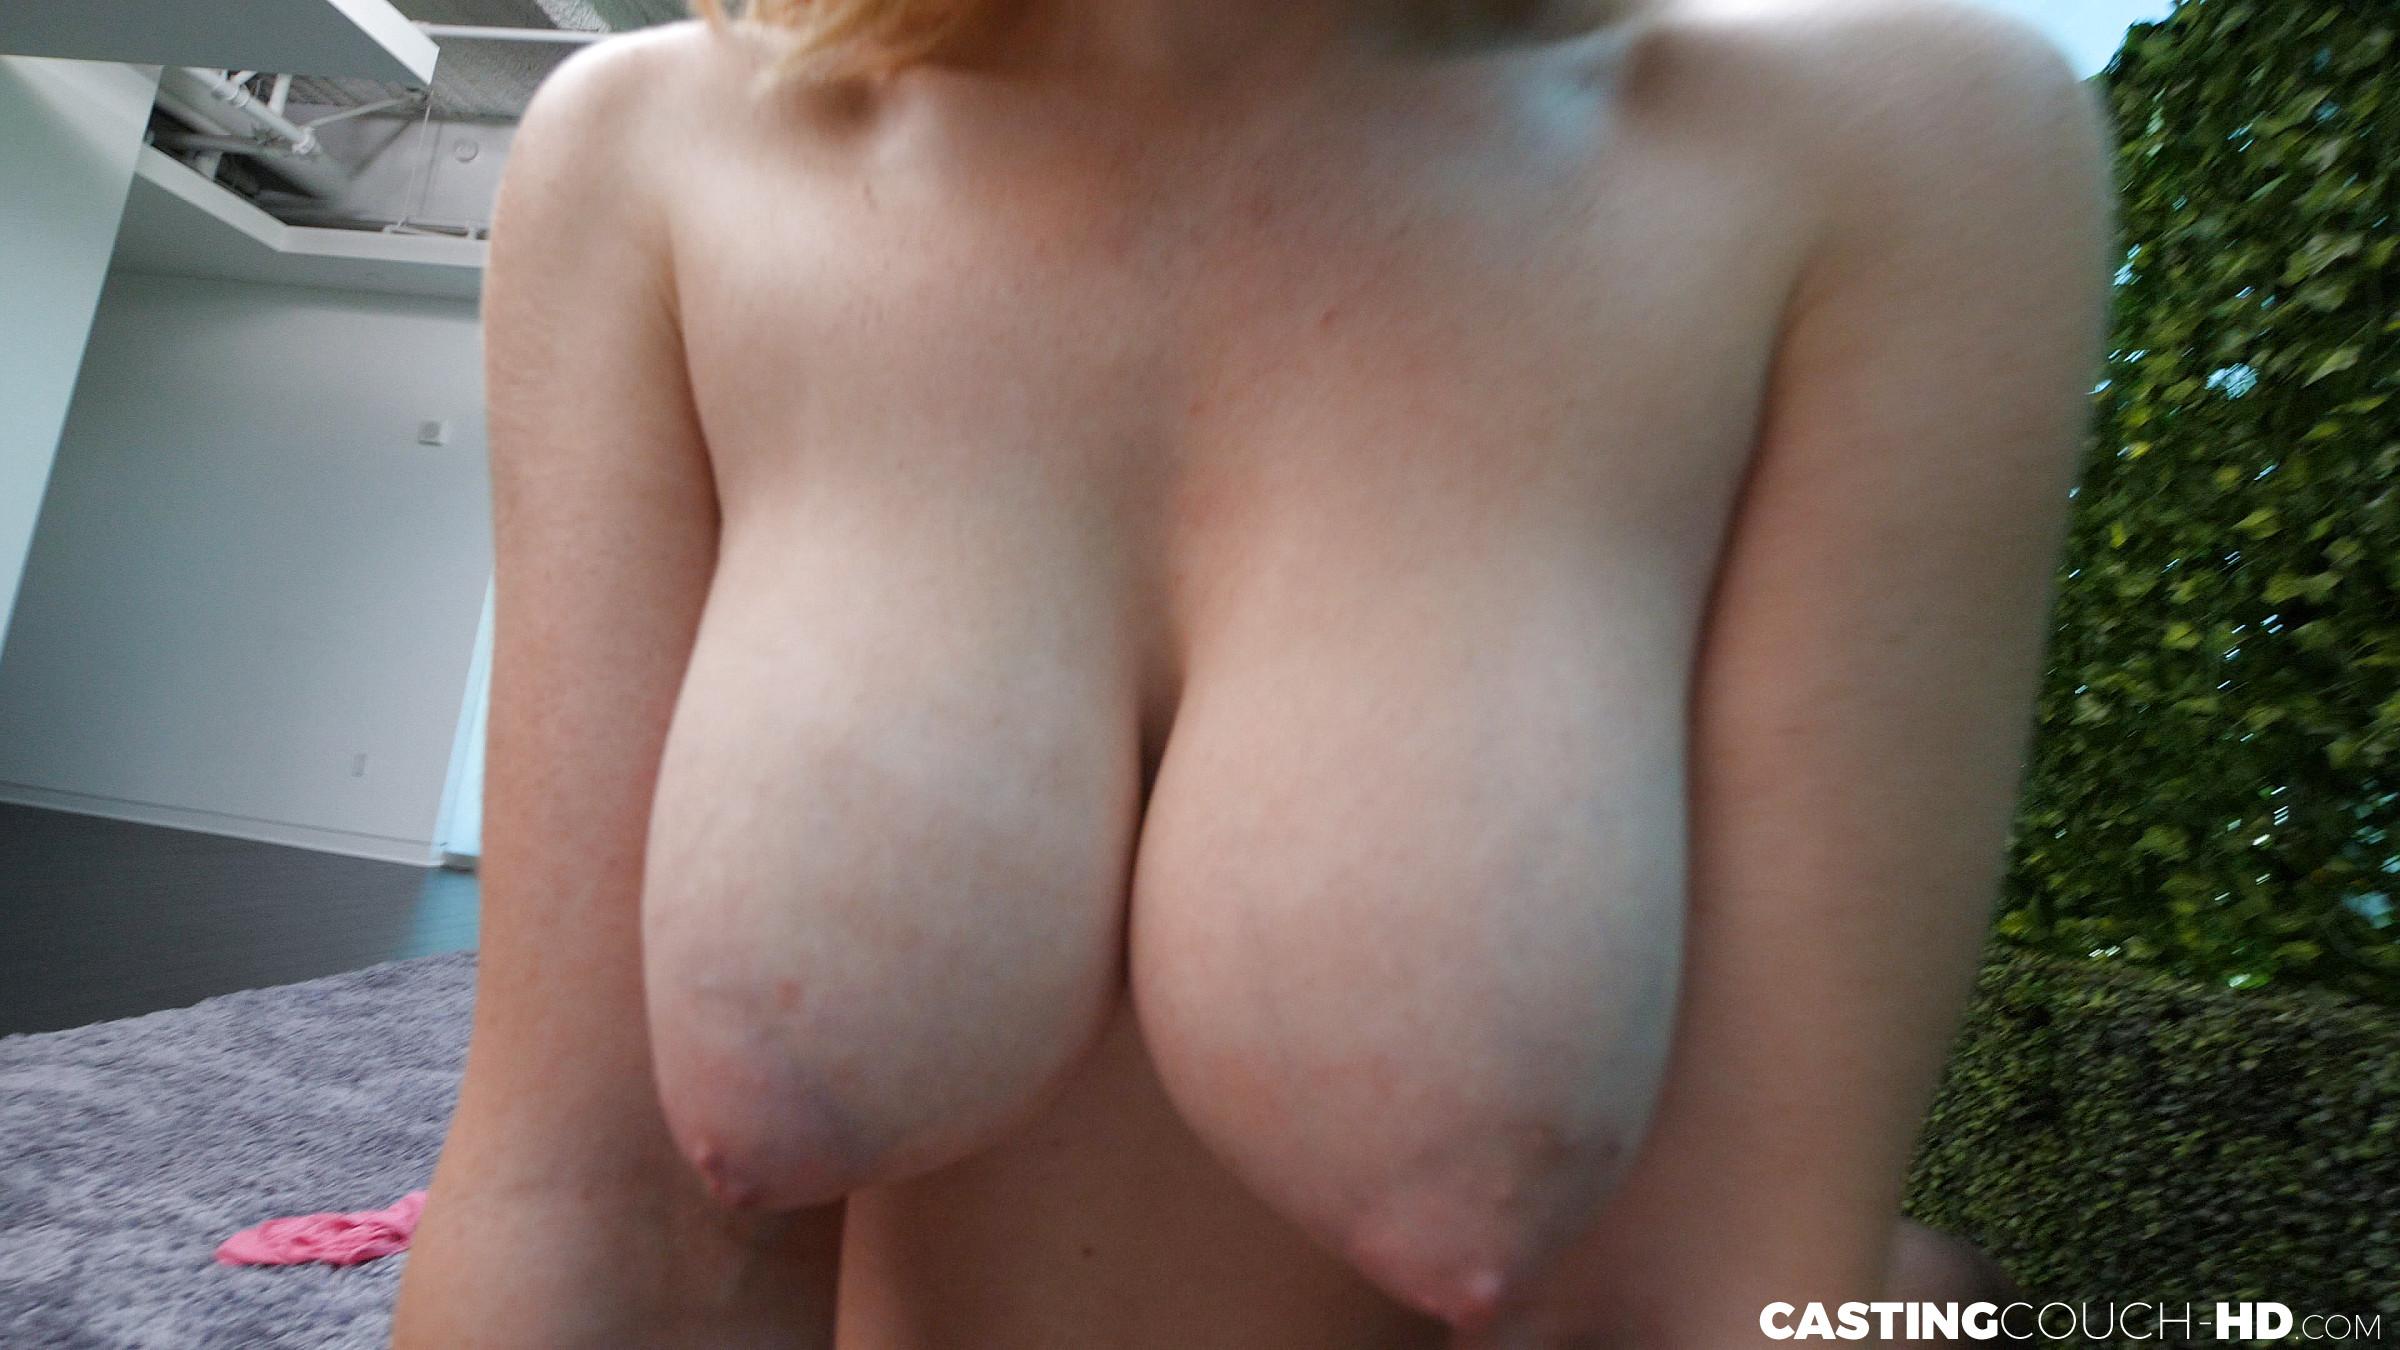 egyptian hot girls sexy boobs